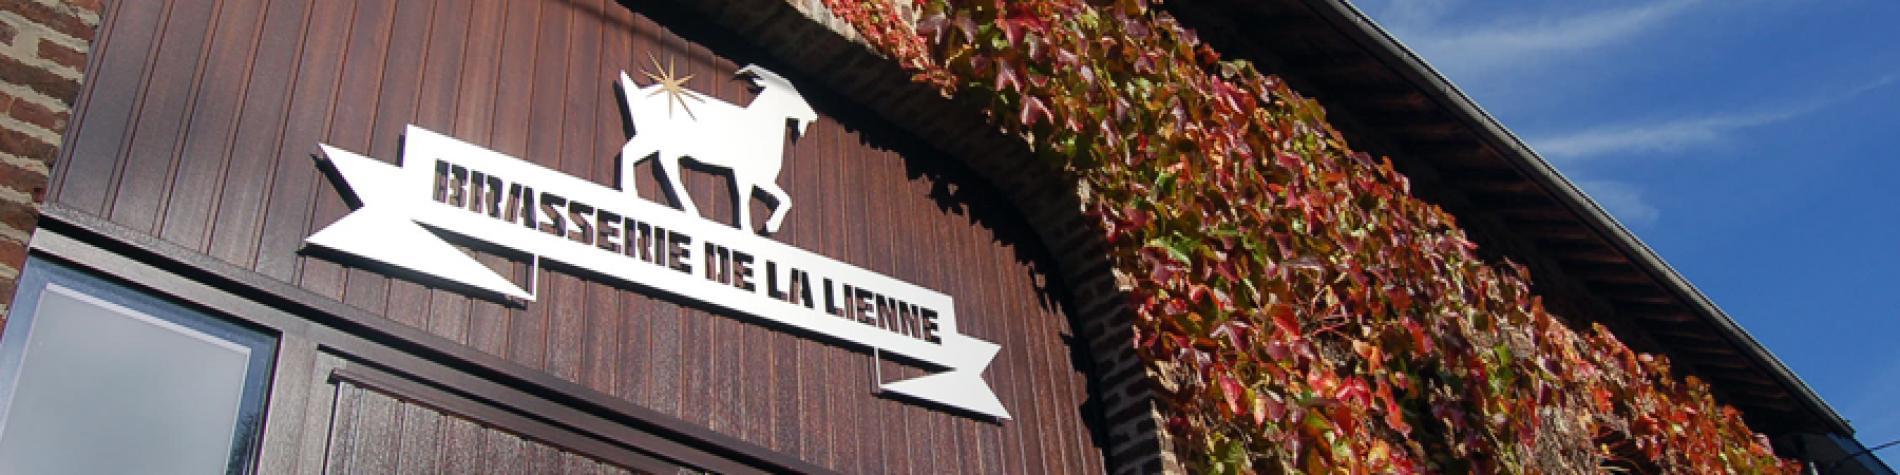 Brasserie de la Lienne - Lierneux